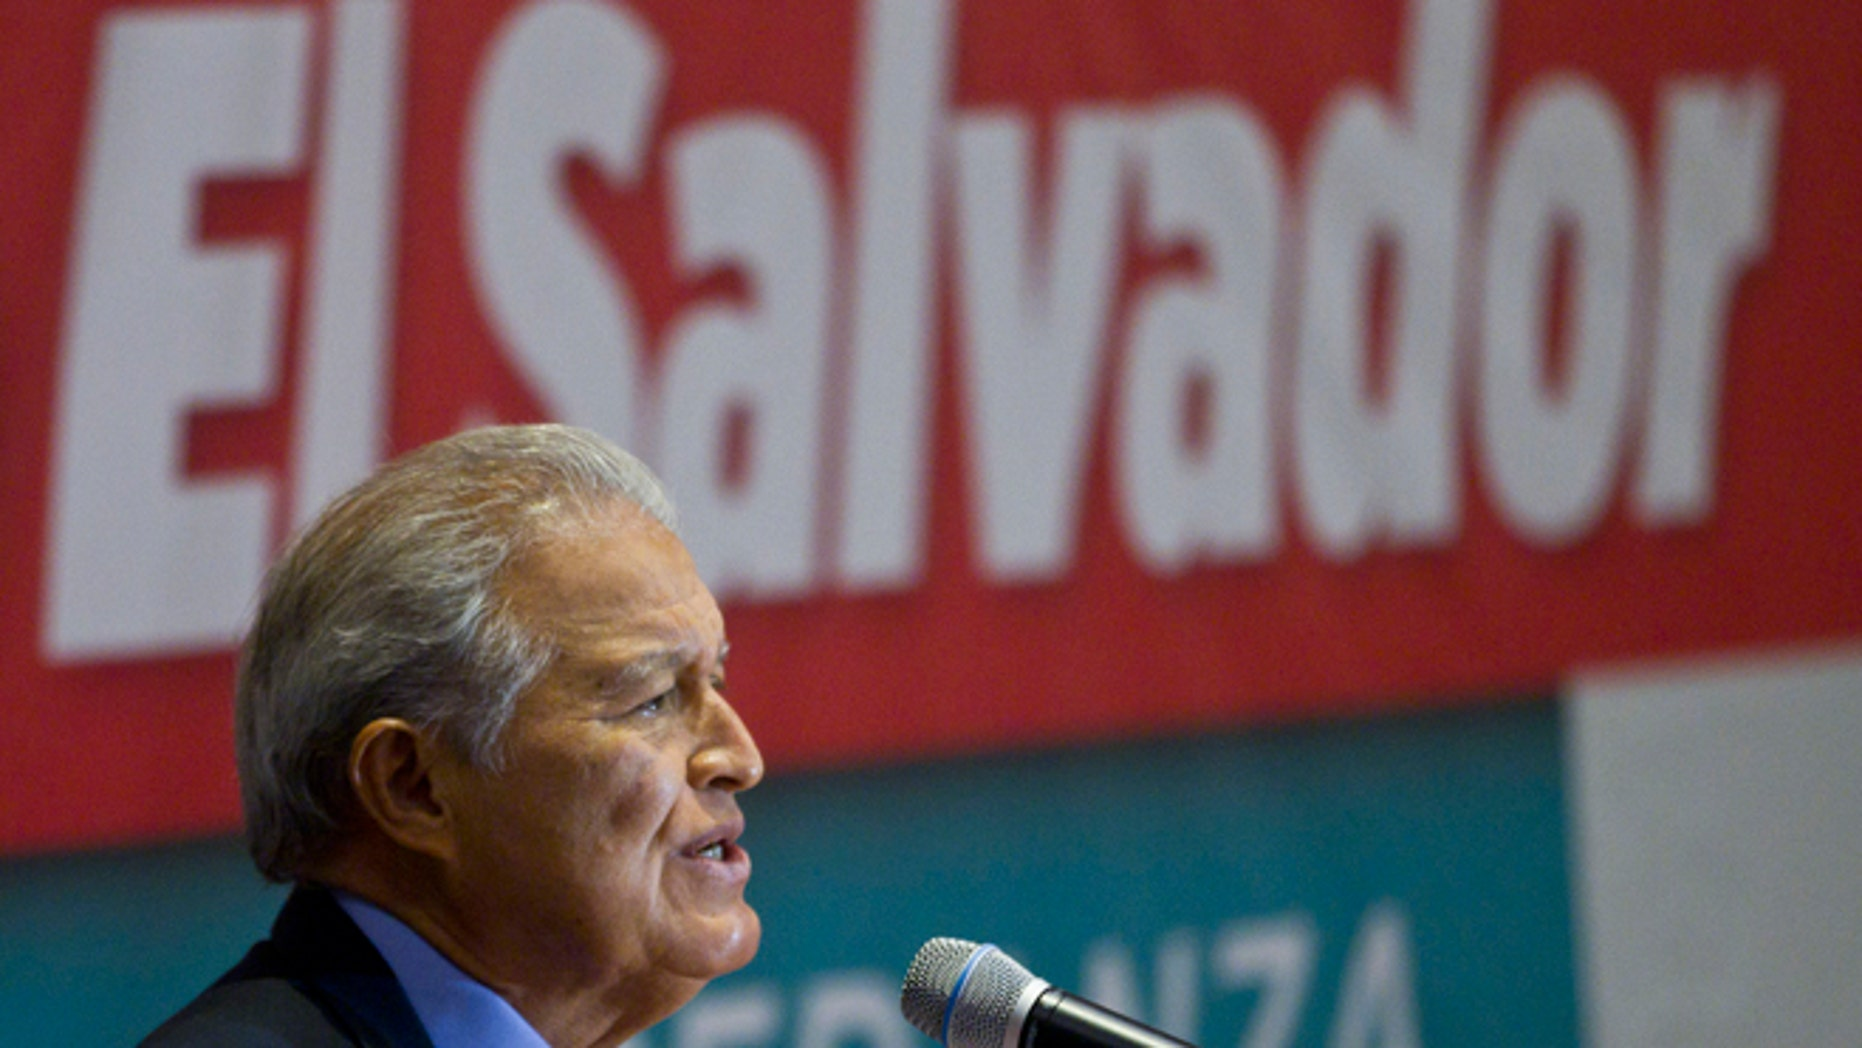 President-elect Salvador Sánchez Céren, of the ruling Farabundo Marti National Liberation Front (FMLN), speaks during a press conference one day after a presidential runoff election in San Salvador, El Salvador, Monday, March 10, 2014. (AP Photo/Esteban Felix)